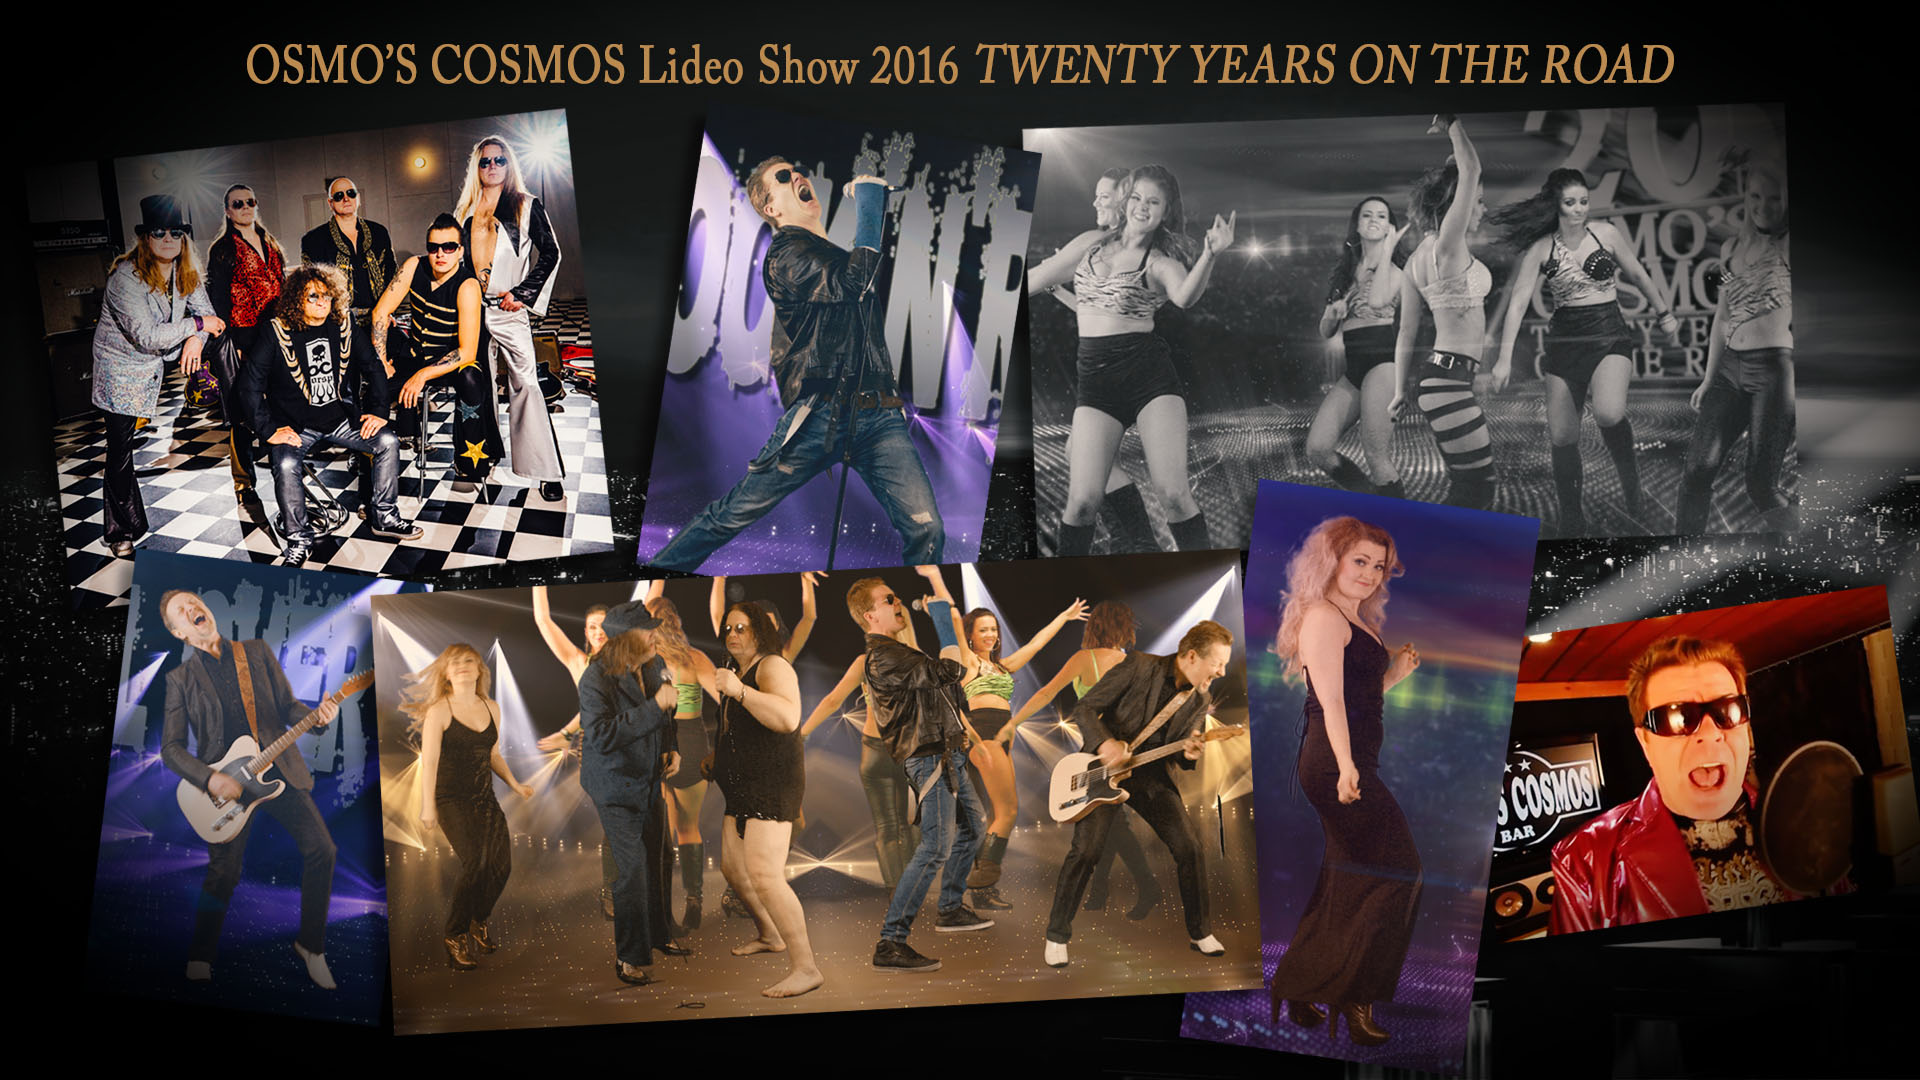 Lideo Show 2016